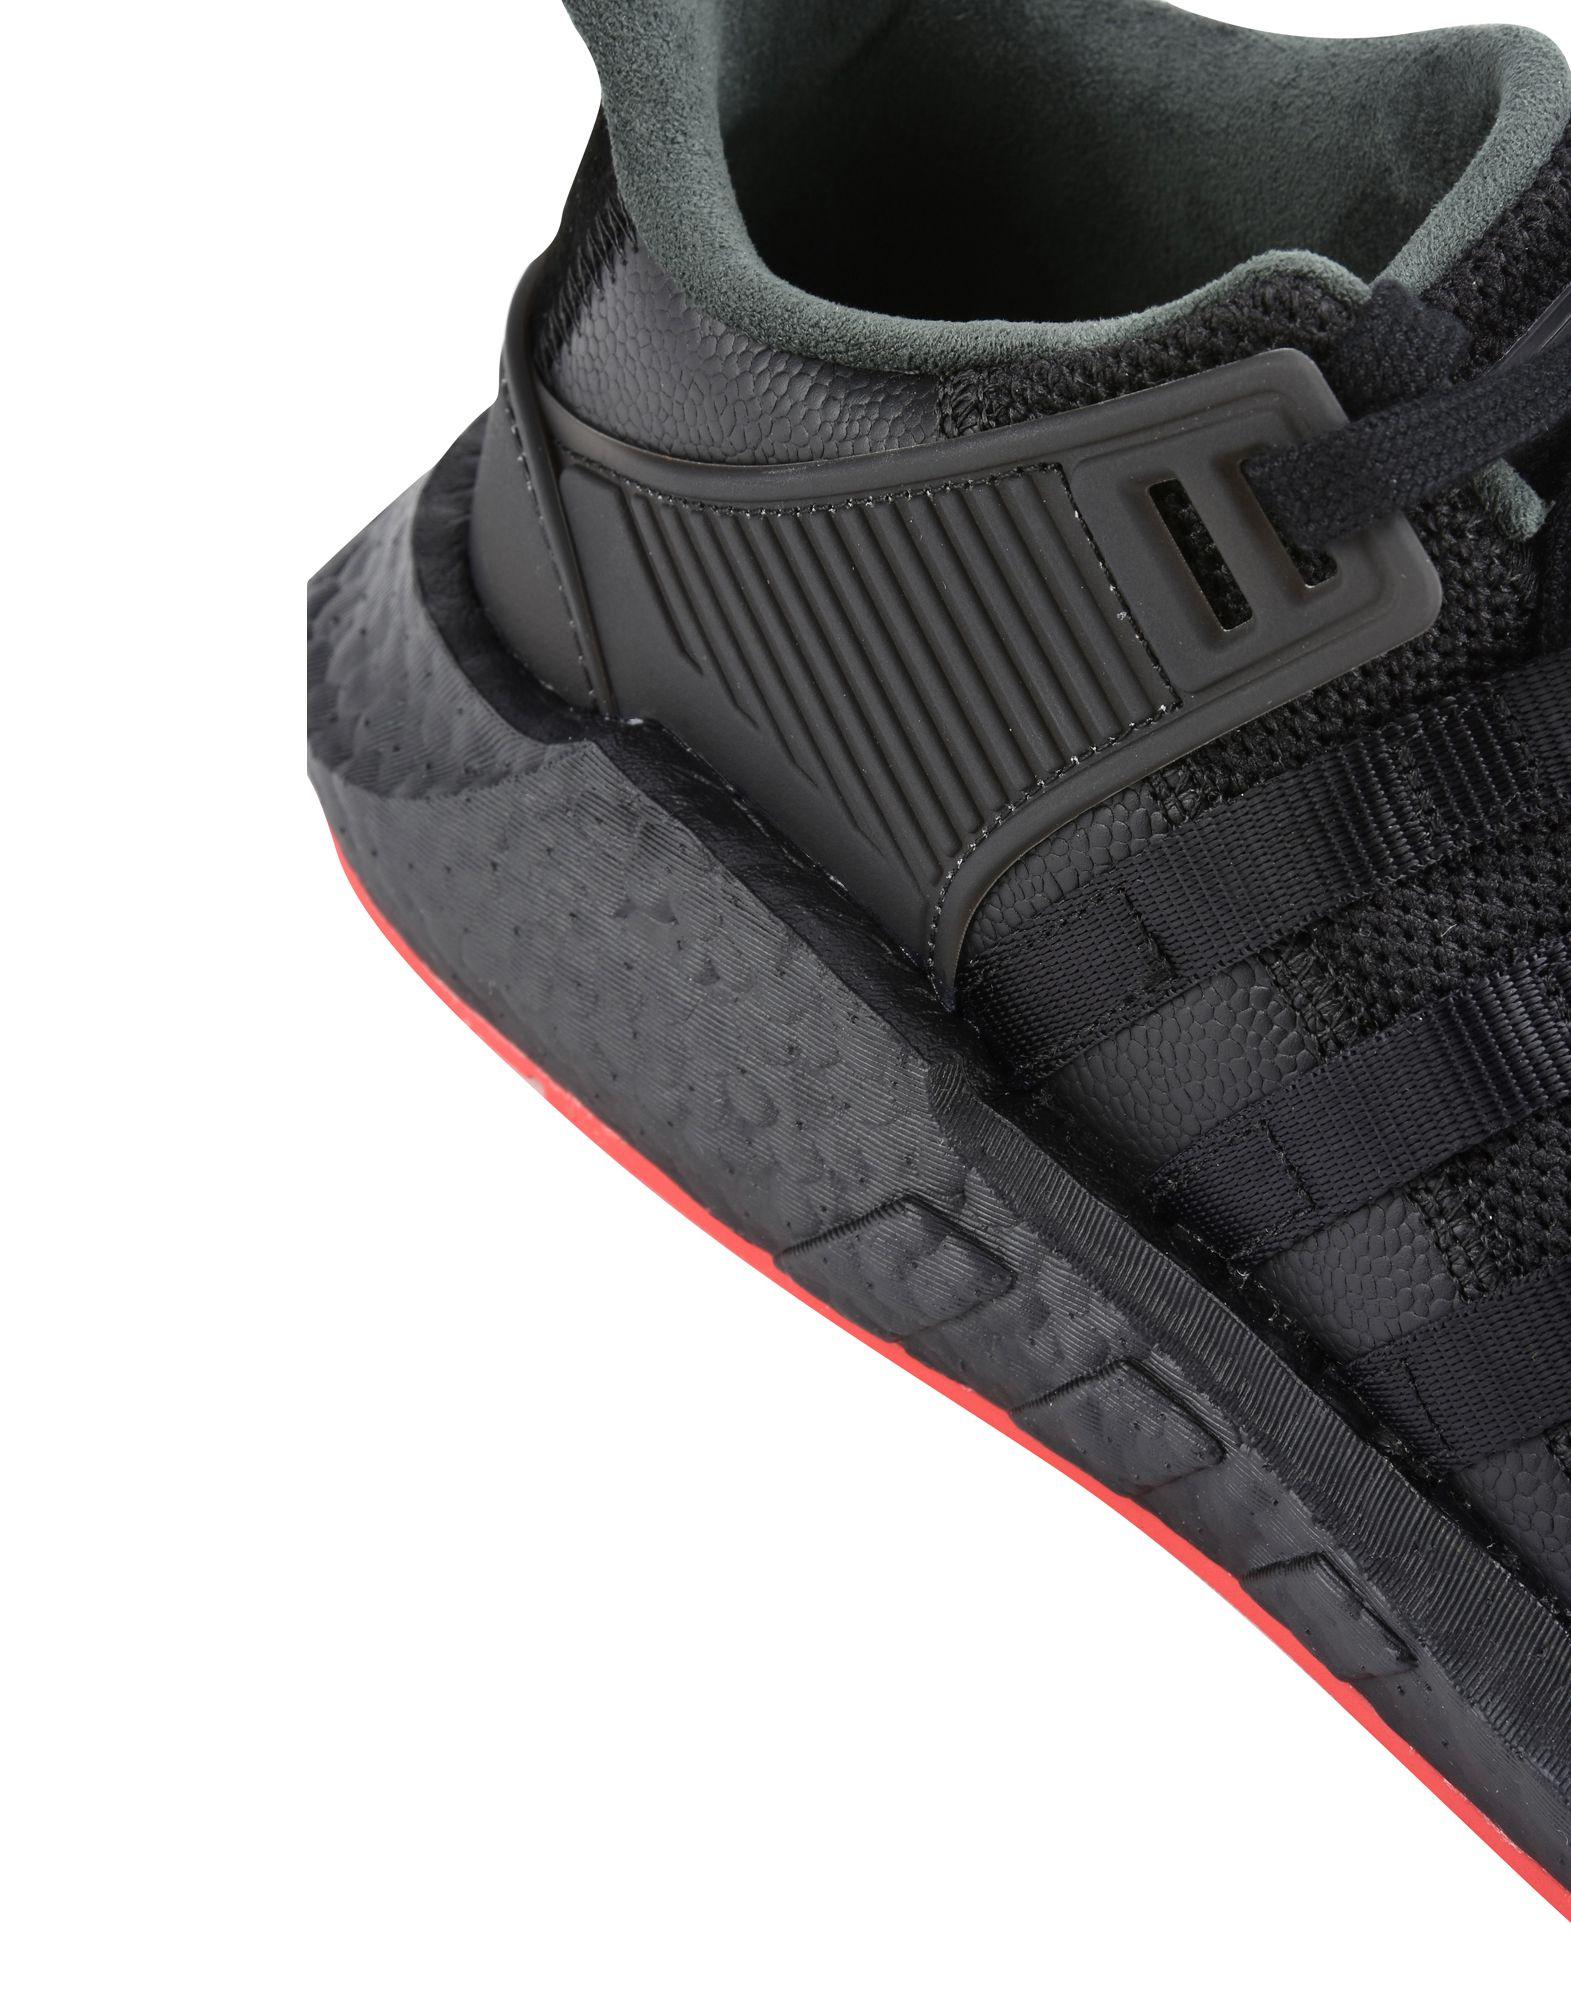 Sneakers Adidas Originals Eqt Support 93/17 - Homme - Sneakers Adidas Originals sur